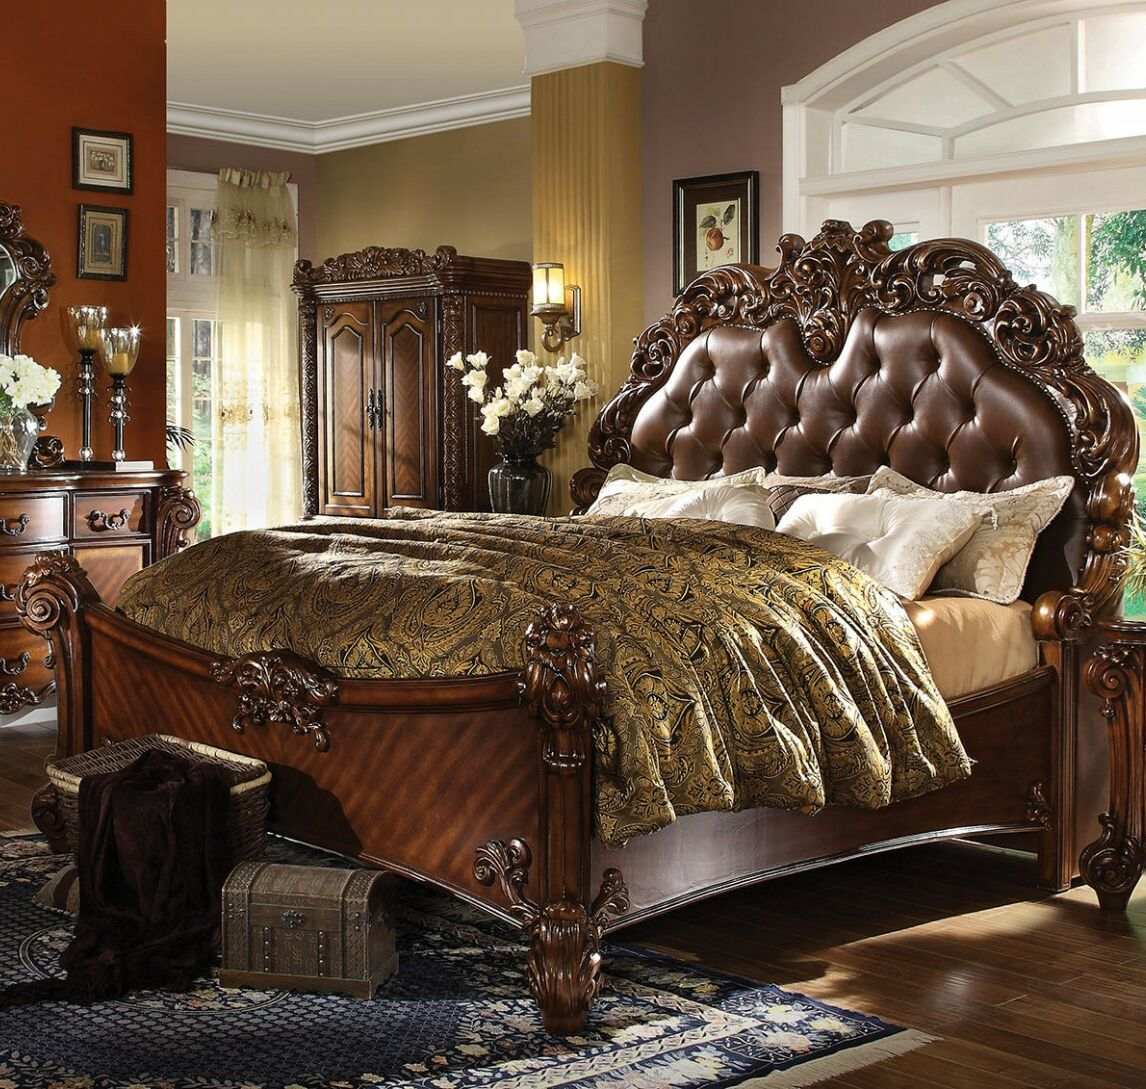 JV Panel Bed Size: King